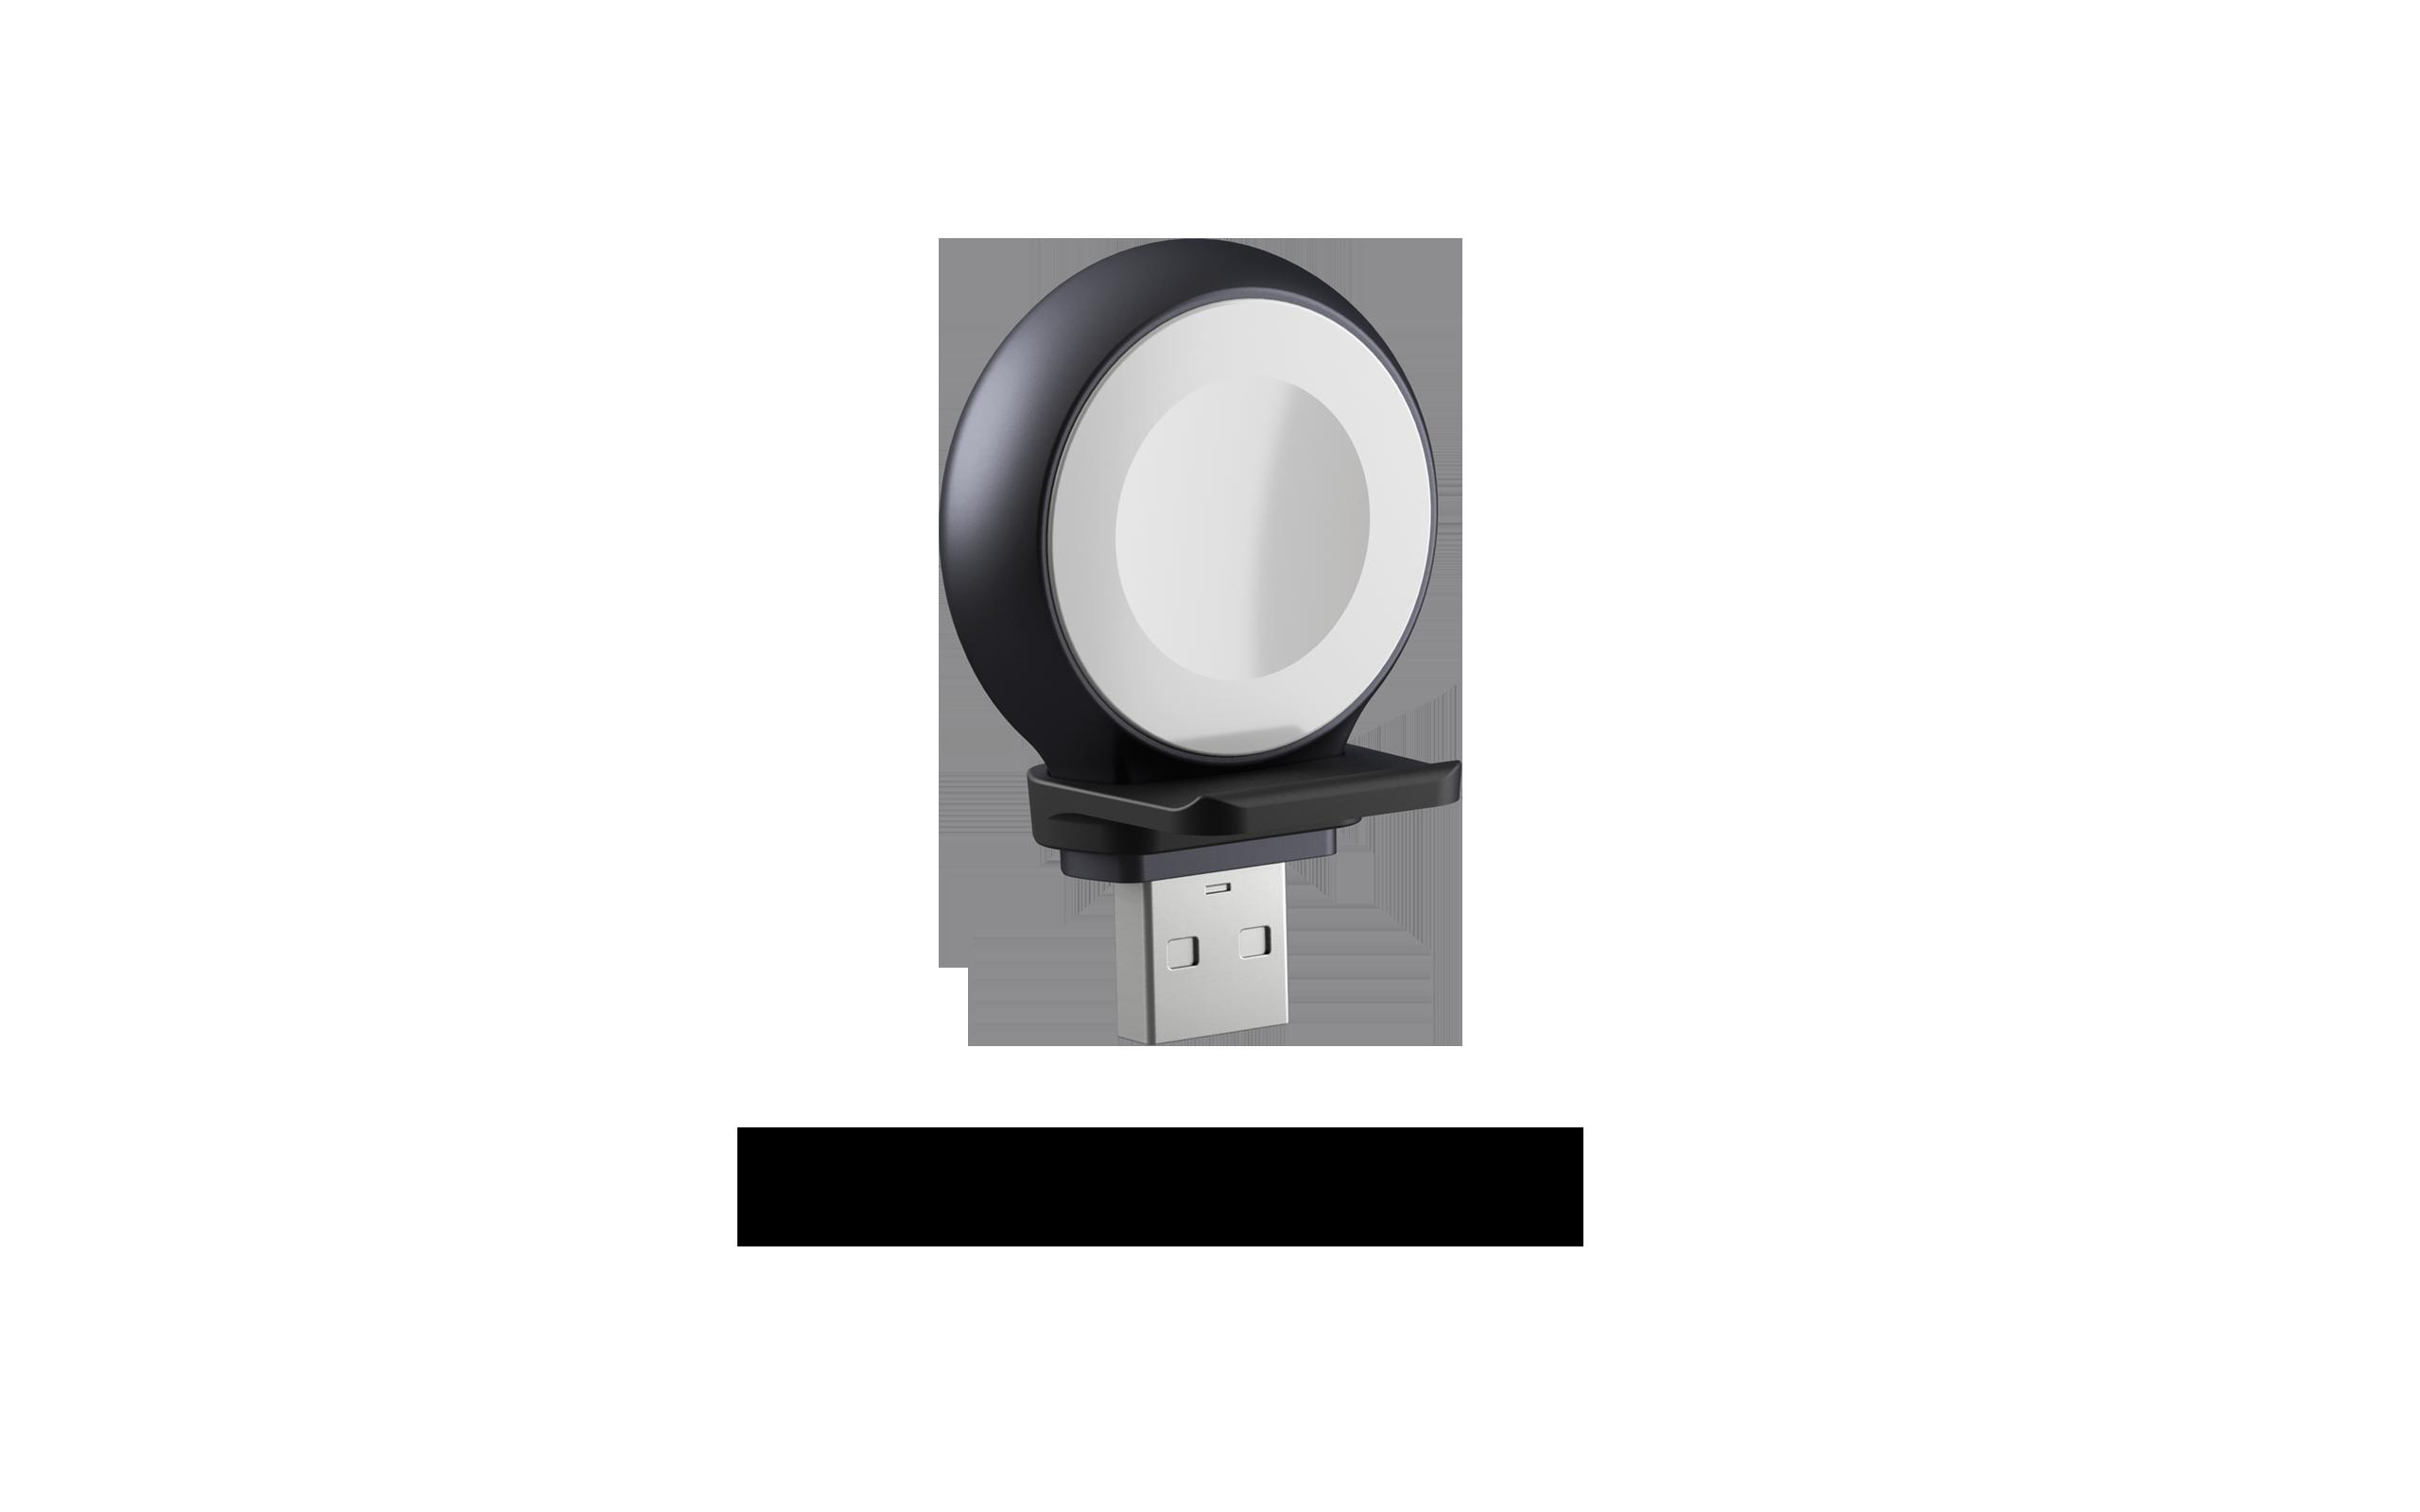 Apple watch USB-Stick extension